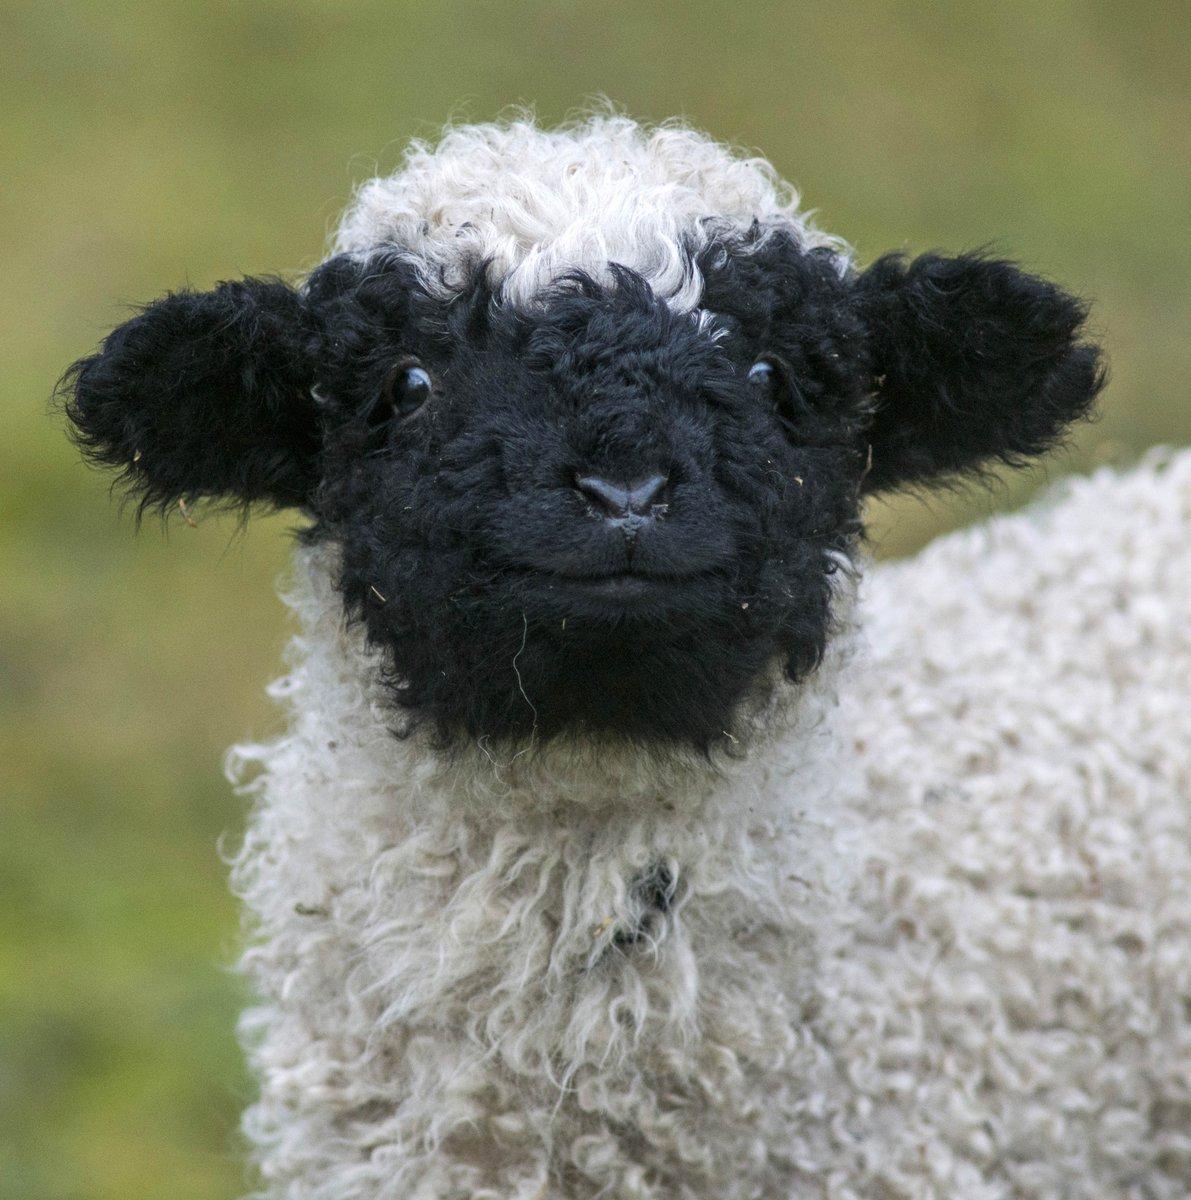 Zoo Tierpark Berlin On Twitter How Sheep Is Your Love Walliser